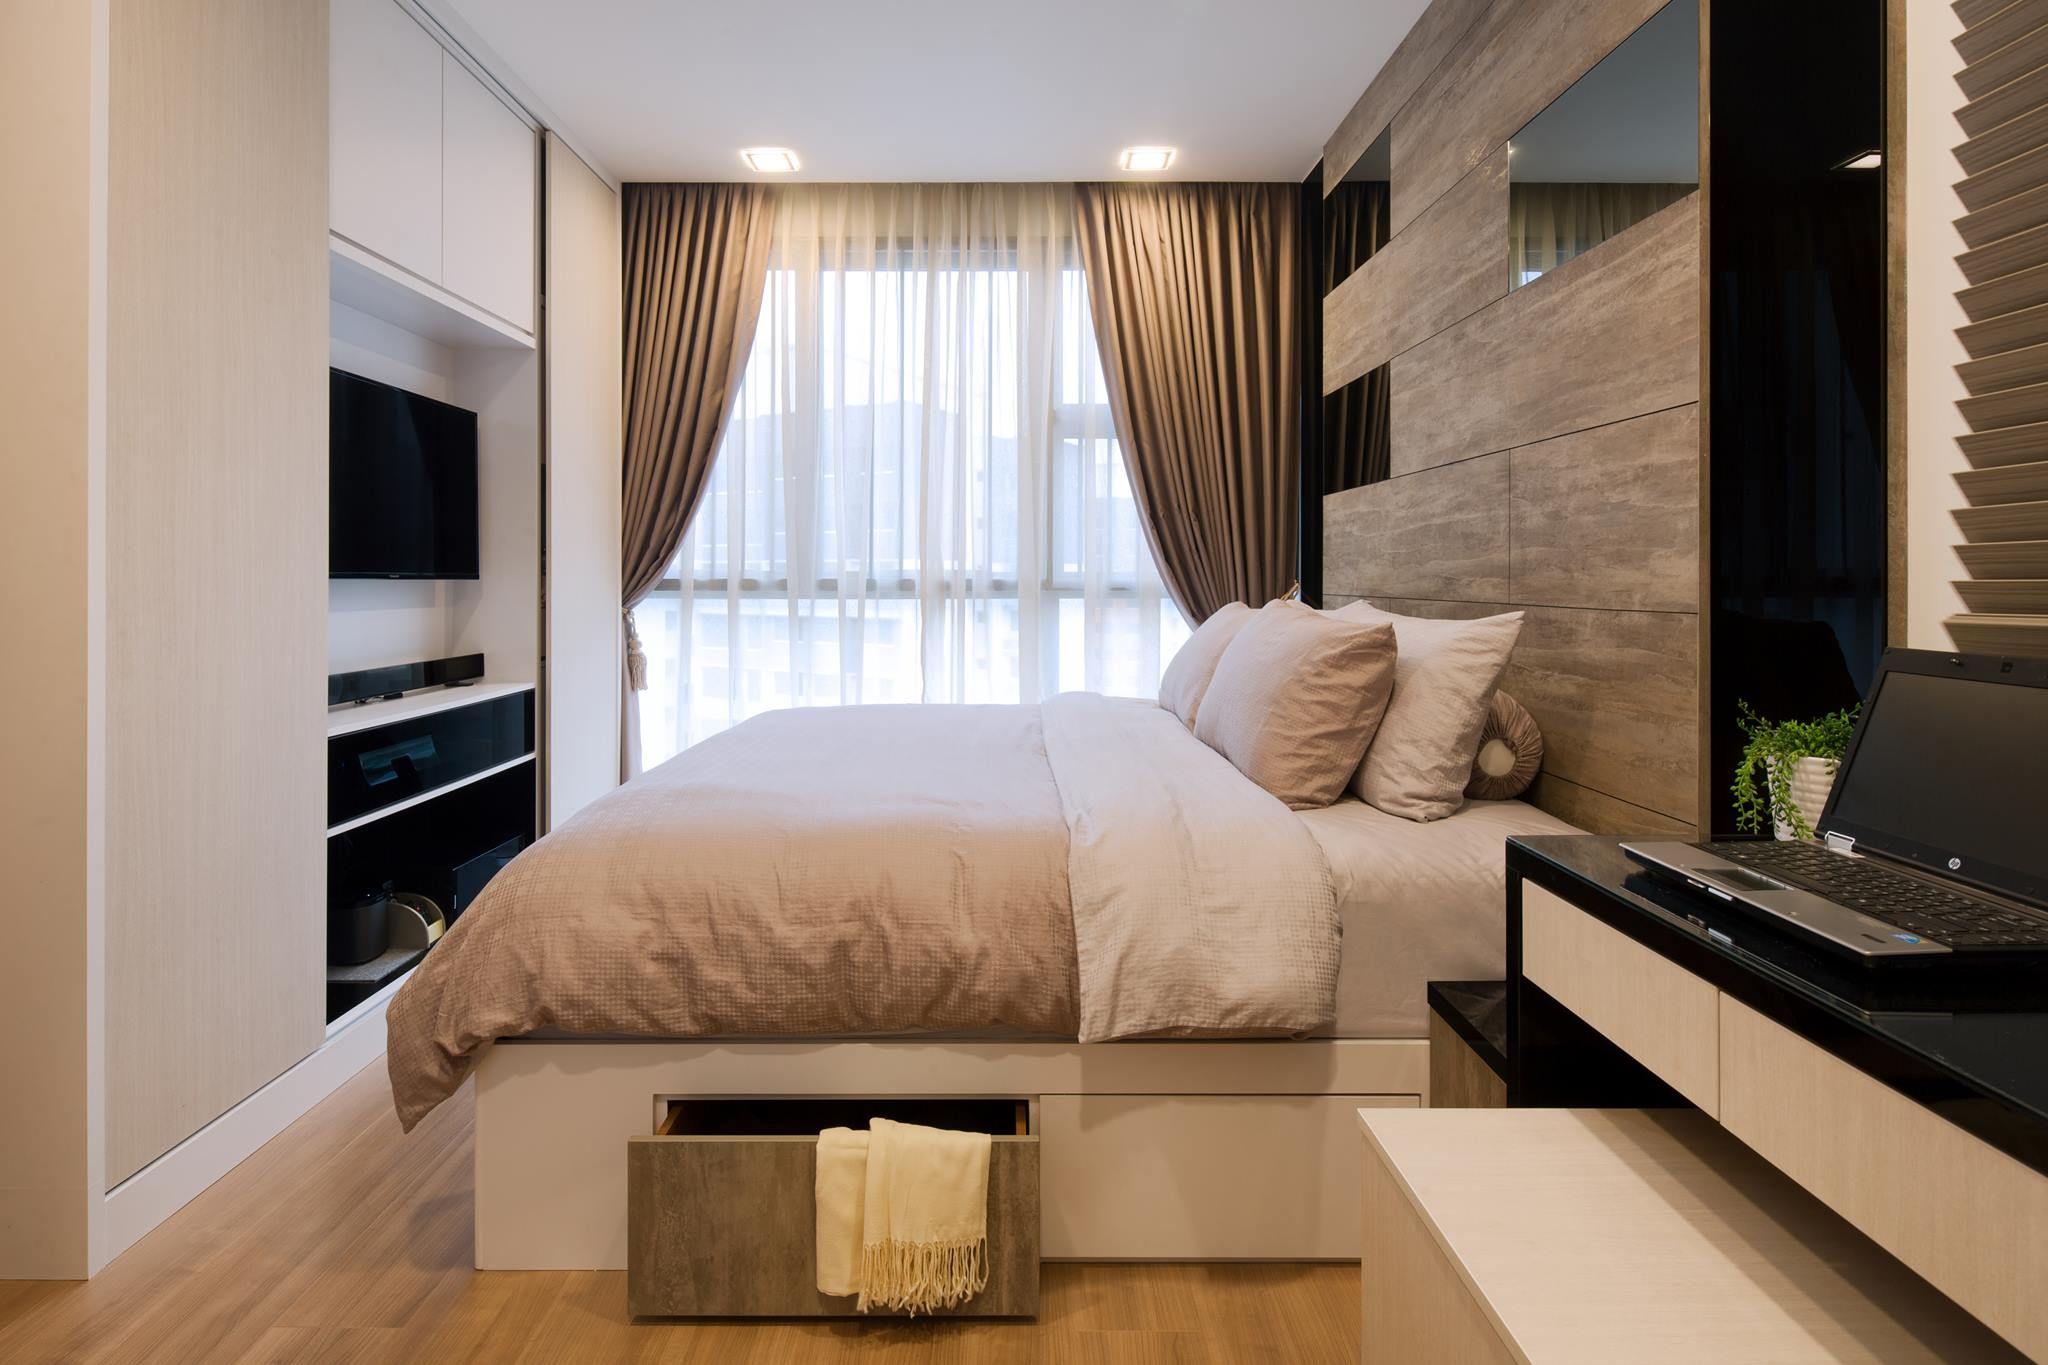 Maximise Storage For 3 Bedroom Condo Condo Interior Design